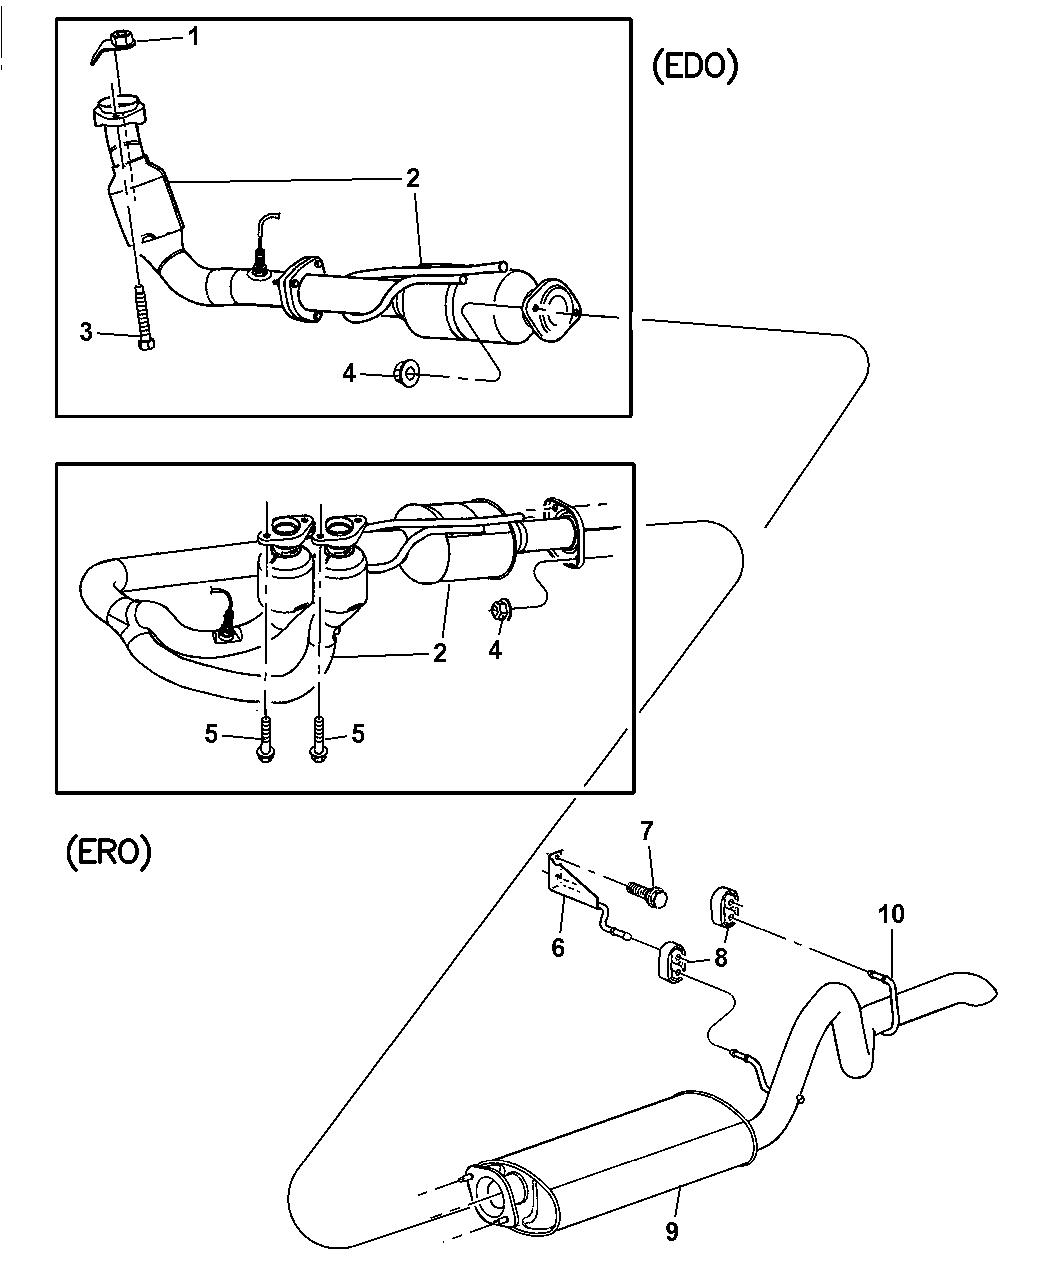 52019408ac genuine jeep hanger muffler yj ignition diagram 2006 jeep wrangler exhaust system